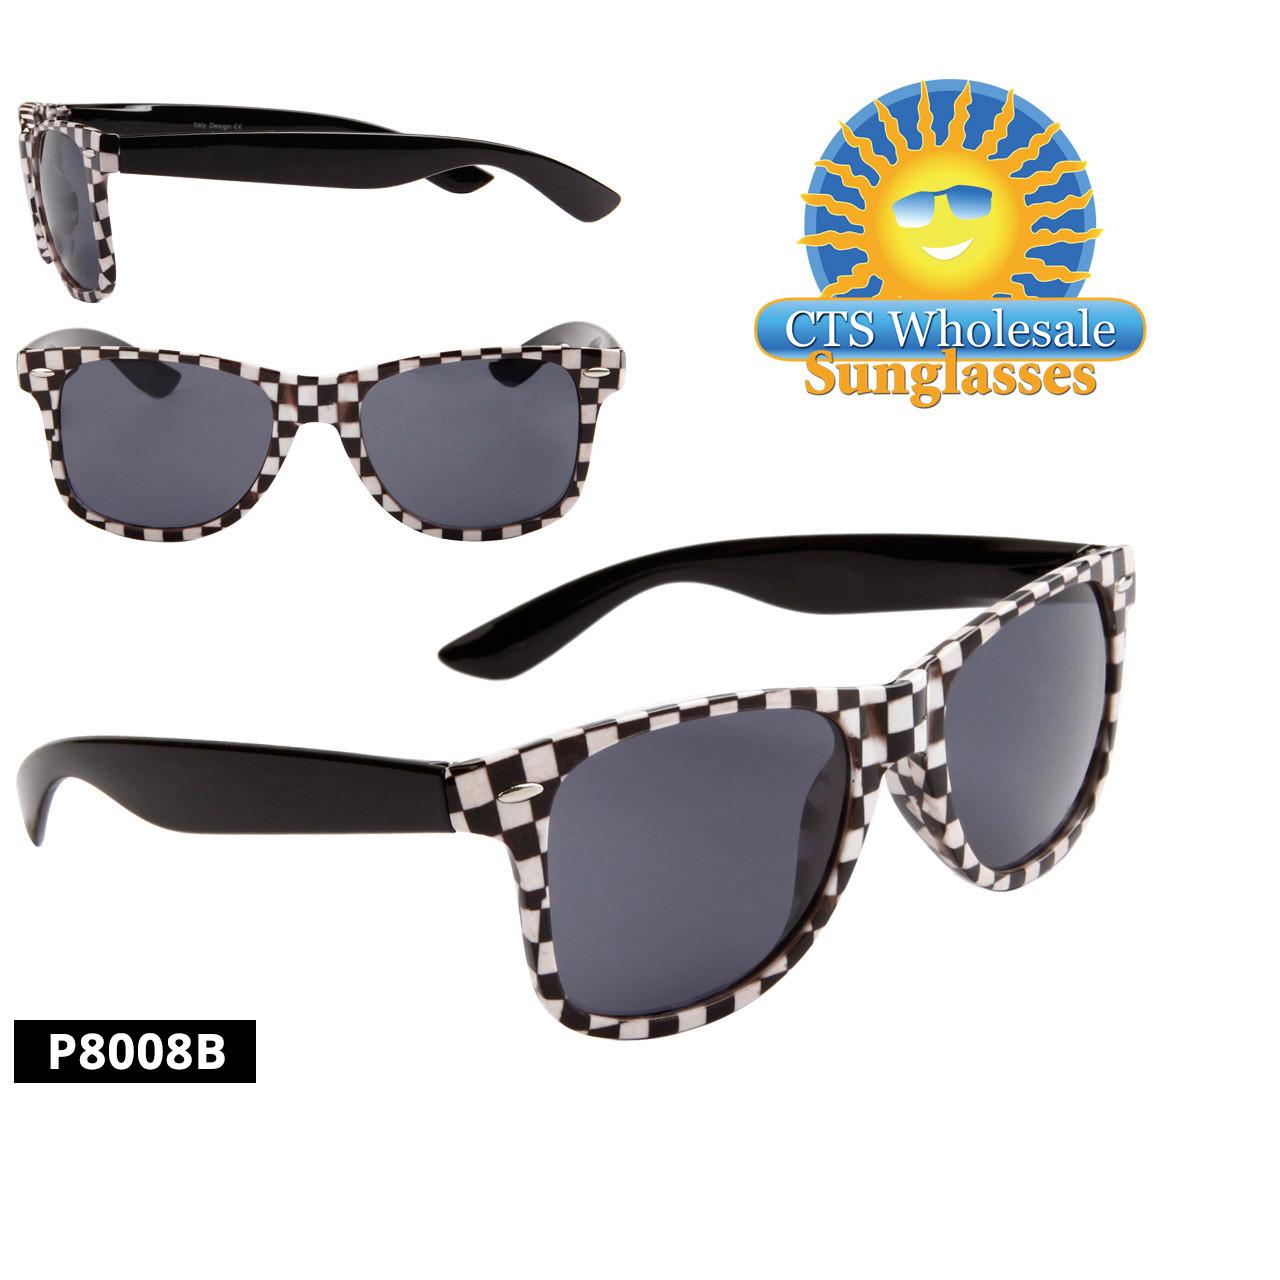 Checkered California Classics Sunglasses - Style P8008B